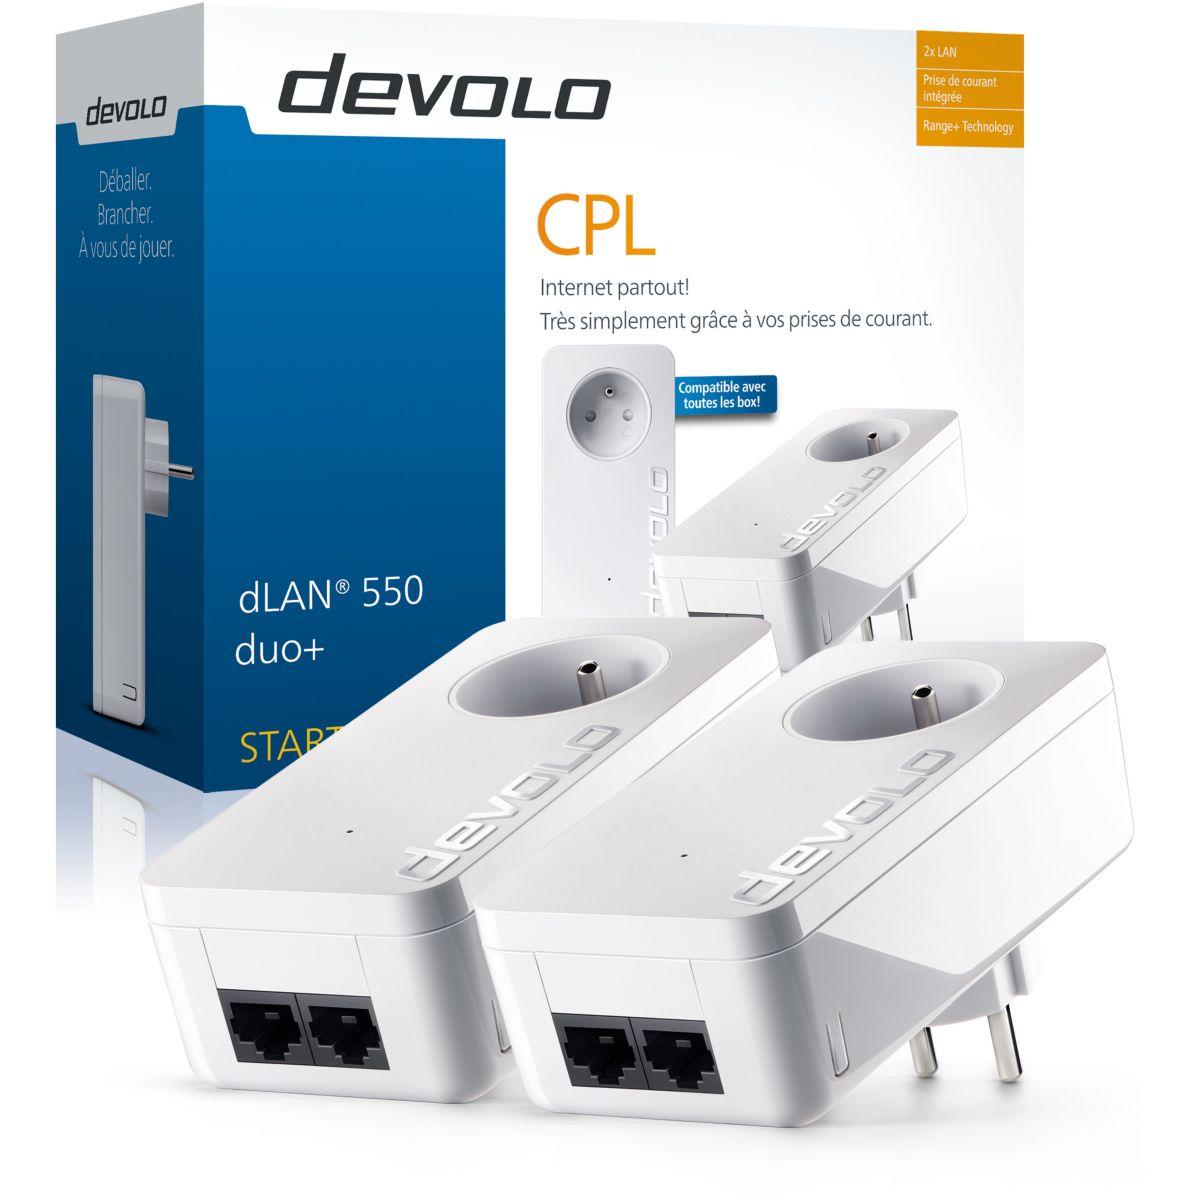 Cpl duo devolo dlan 550 + starter kit - livraison offerte : code liv